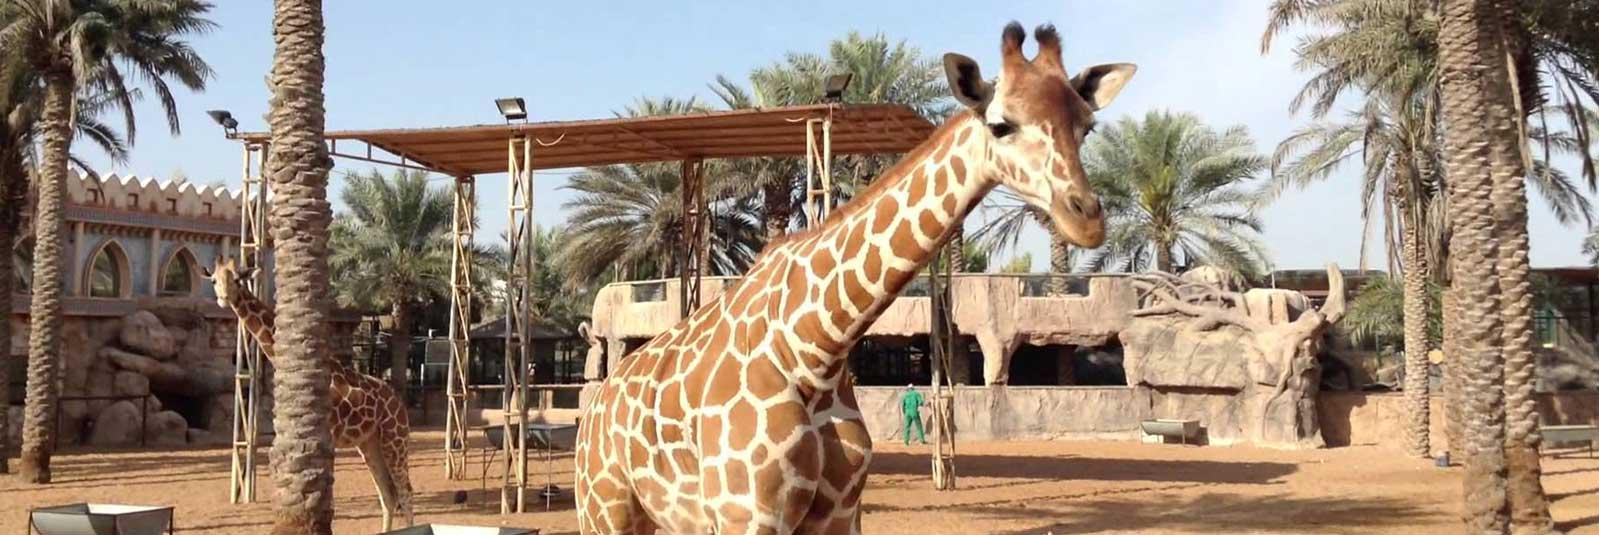 Emirates-Zoo.jpg